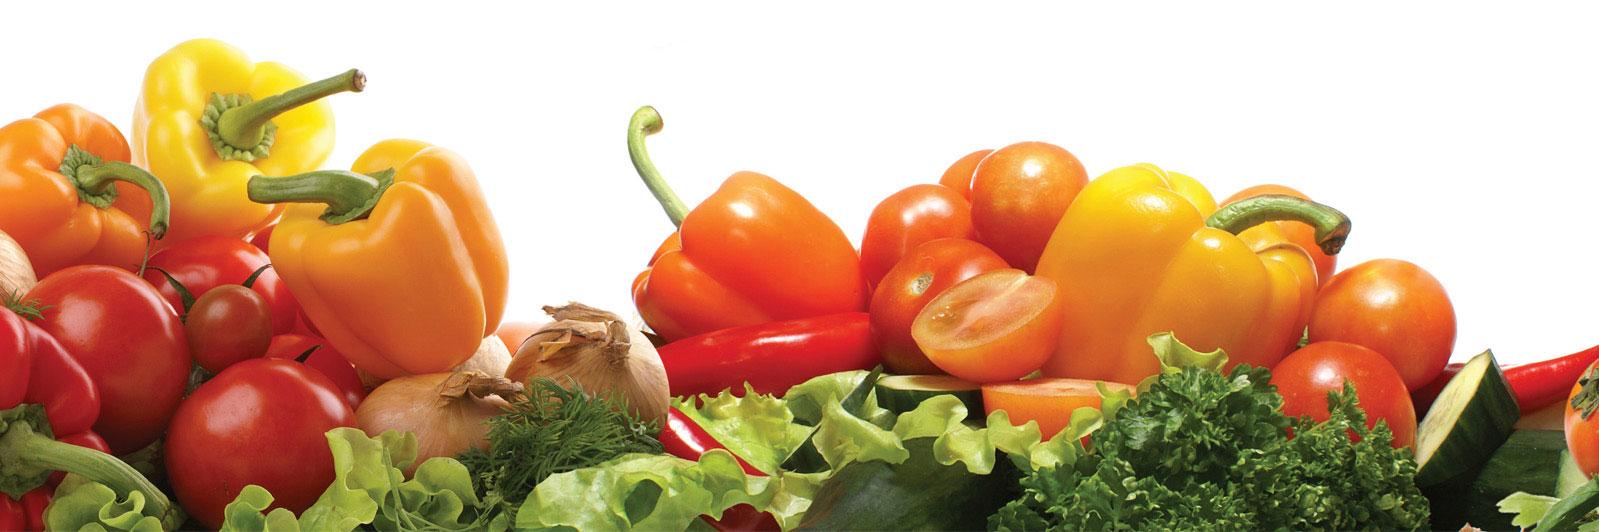 vegetable2-1600-2